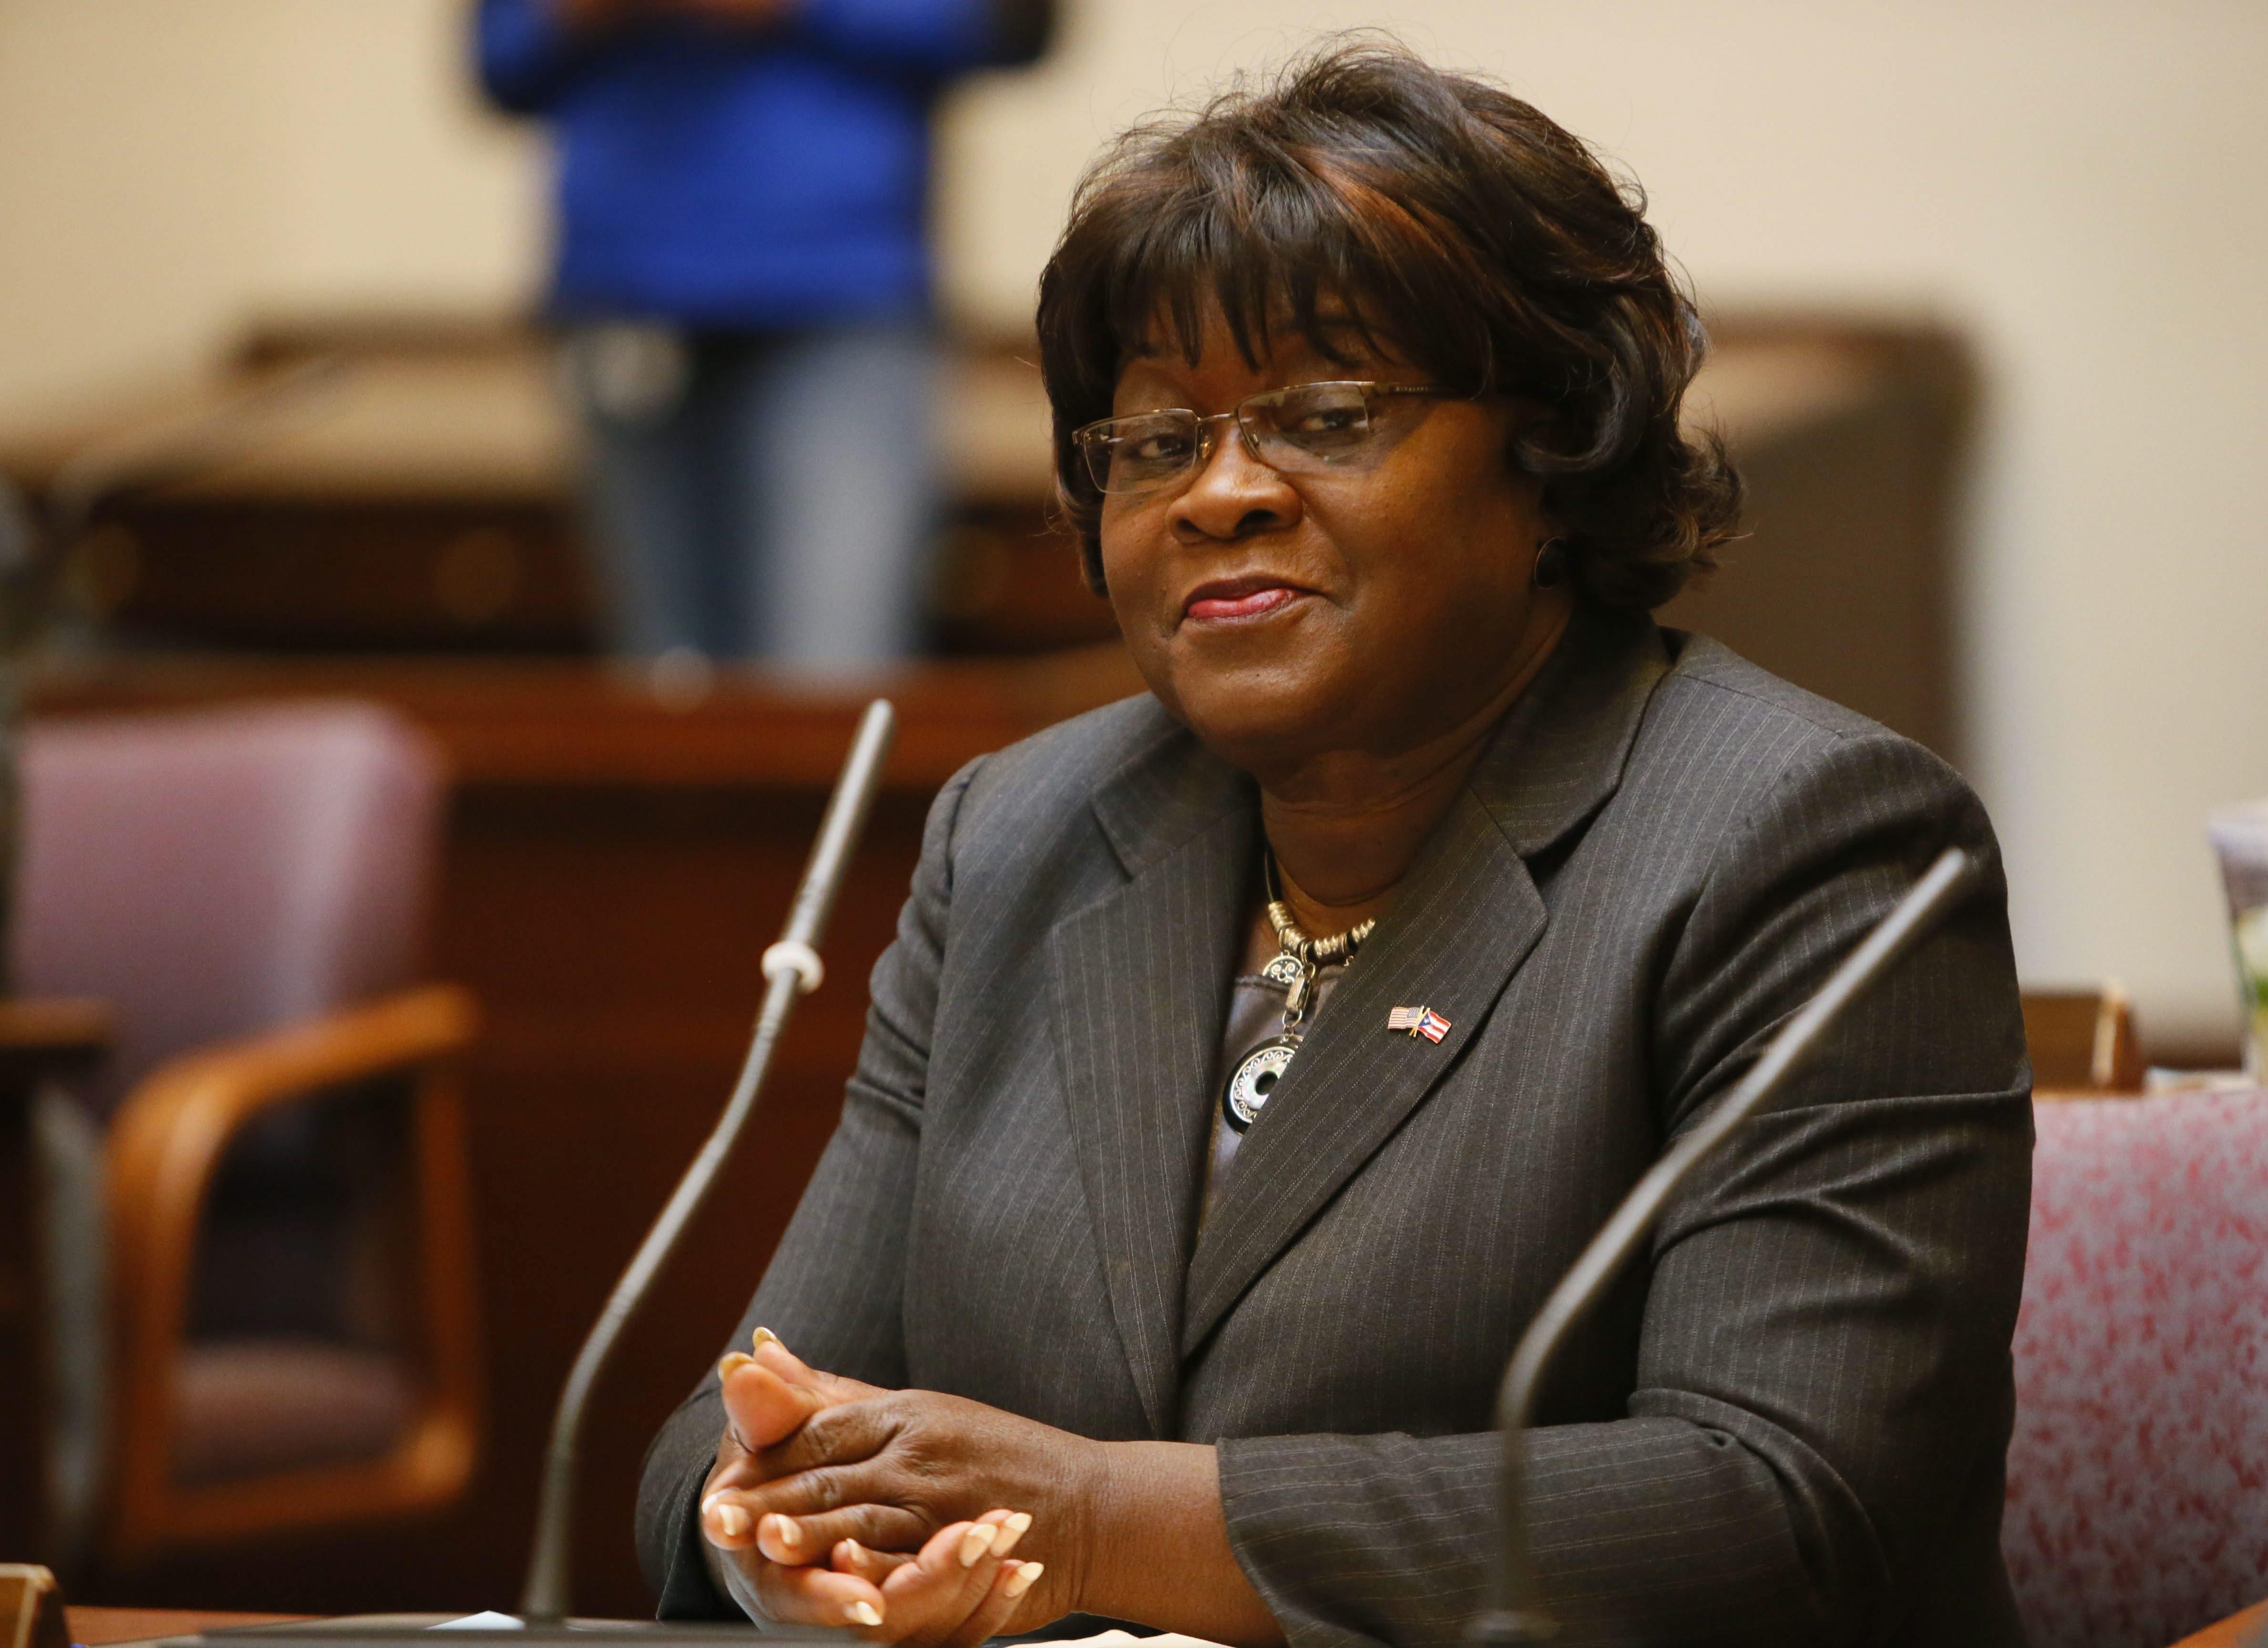 Erie County Legislator Betty Jean Grant was named minority leader in January.